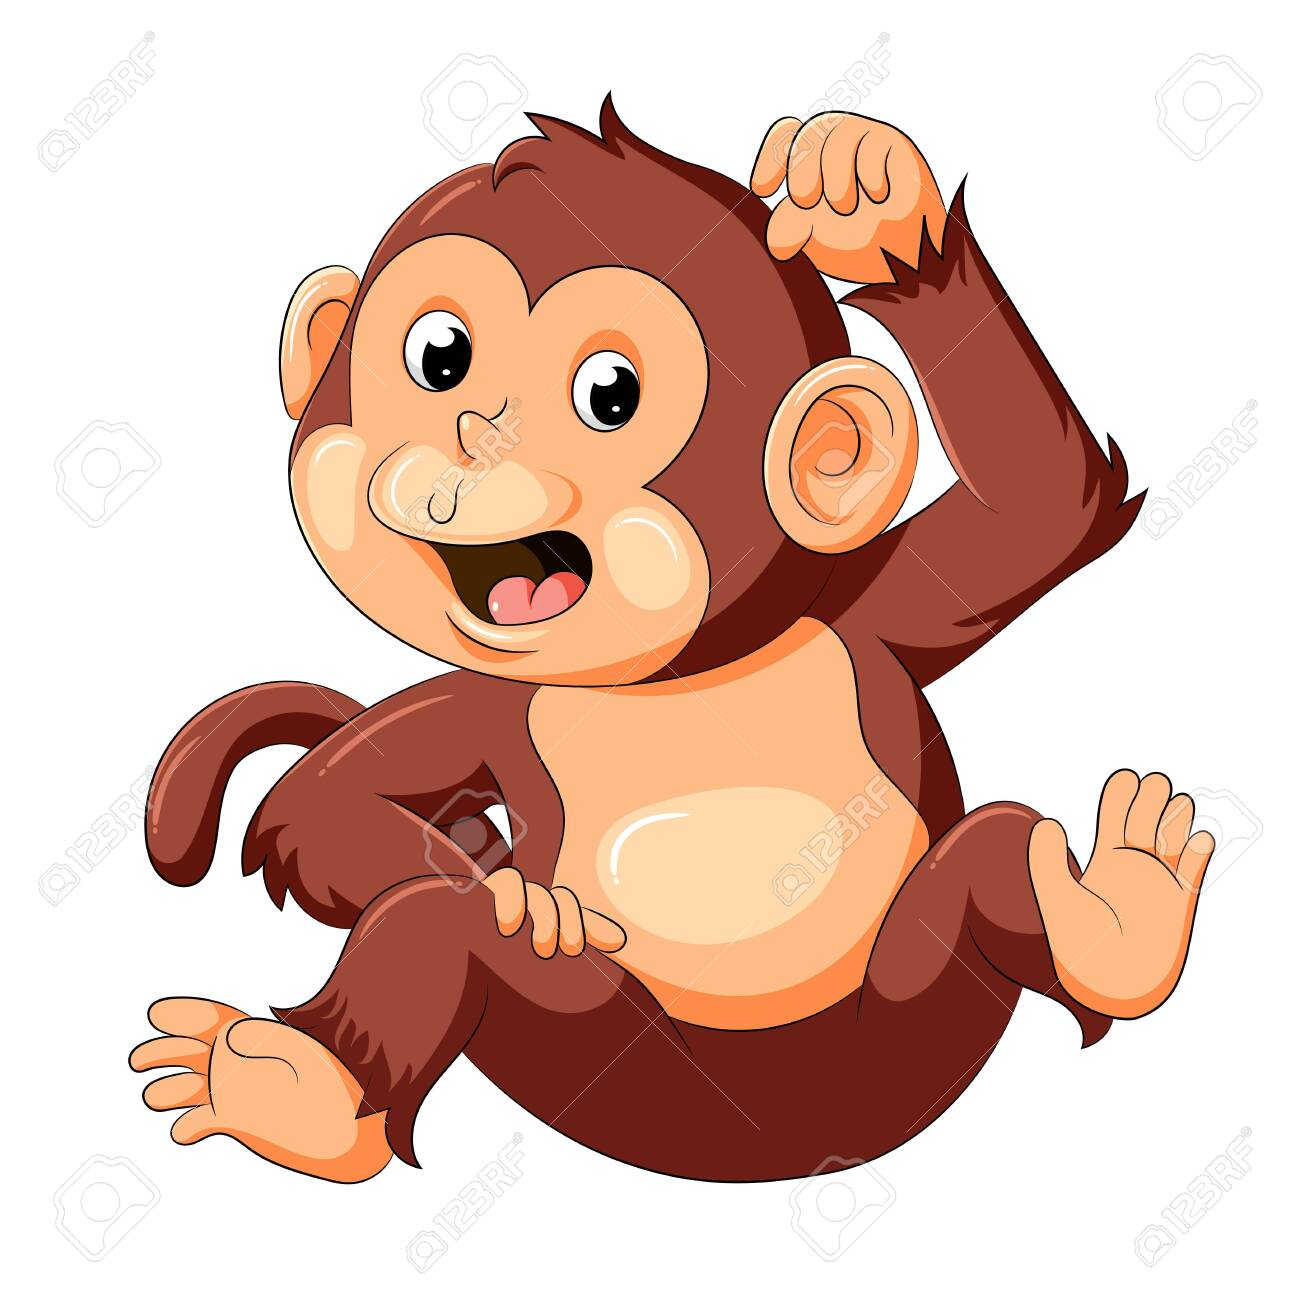 illustration of baby monkey with good posing - 128159903